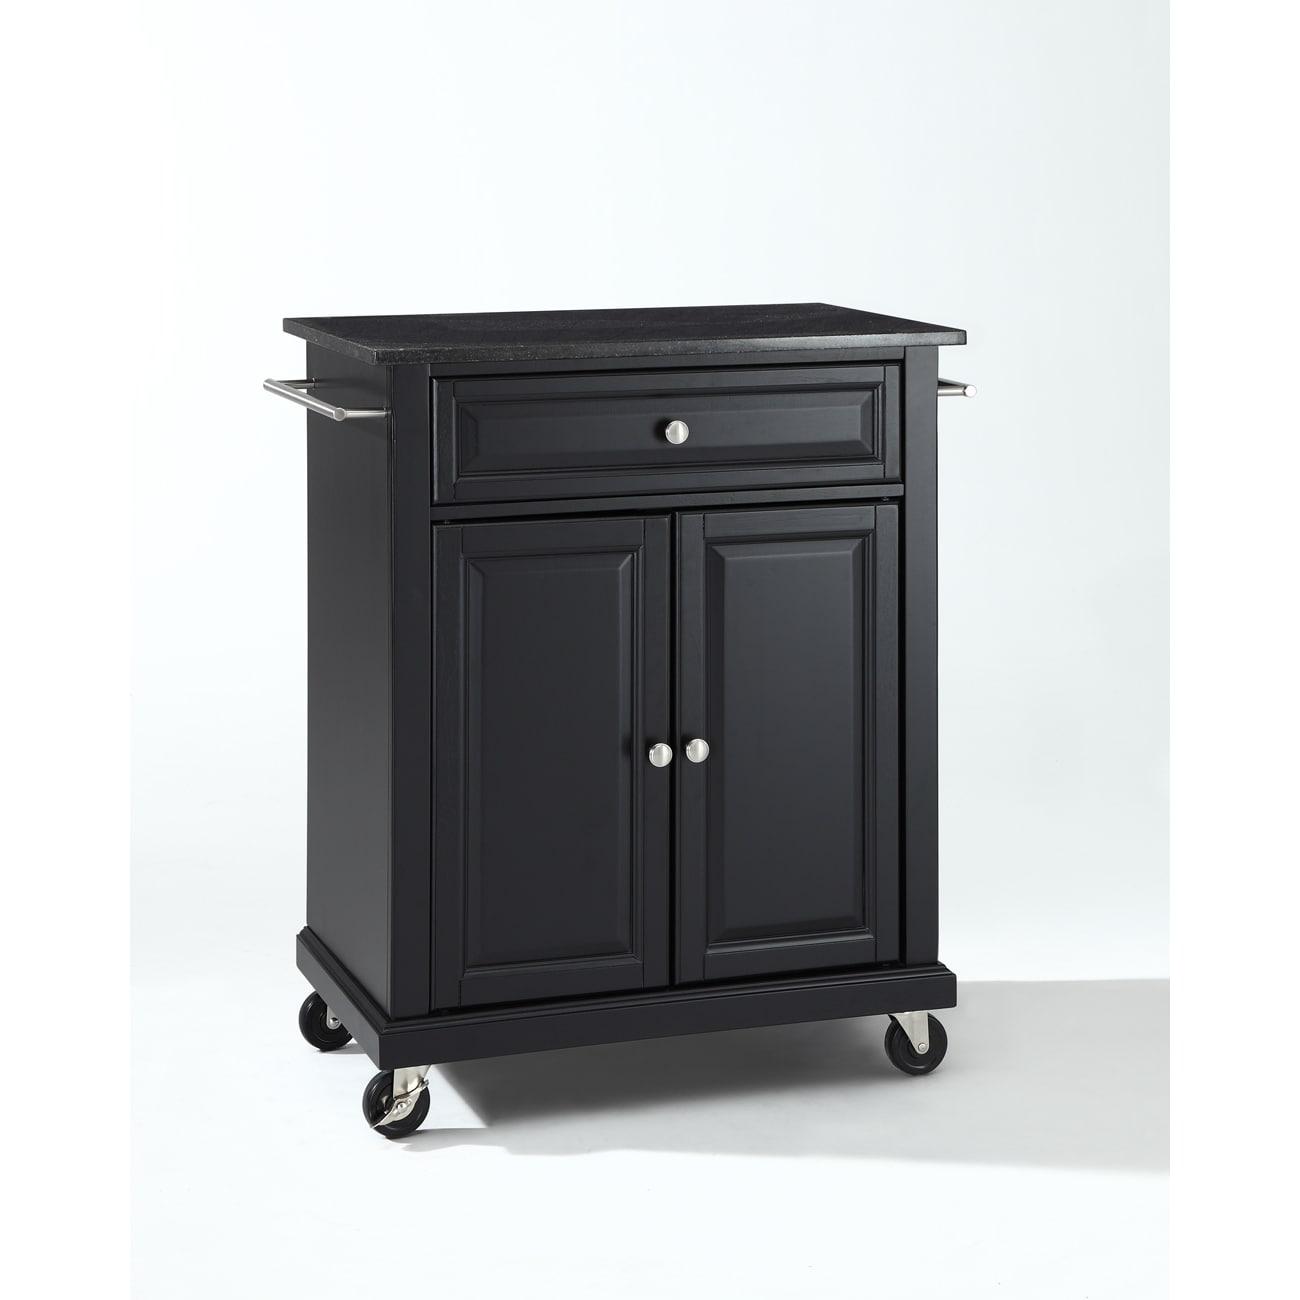 Solid Black Granite Top Portable Kitchen Cart/Island in Black Finish